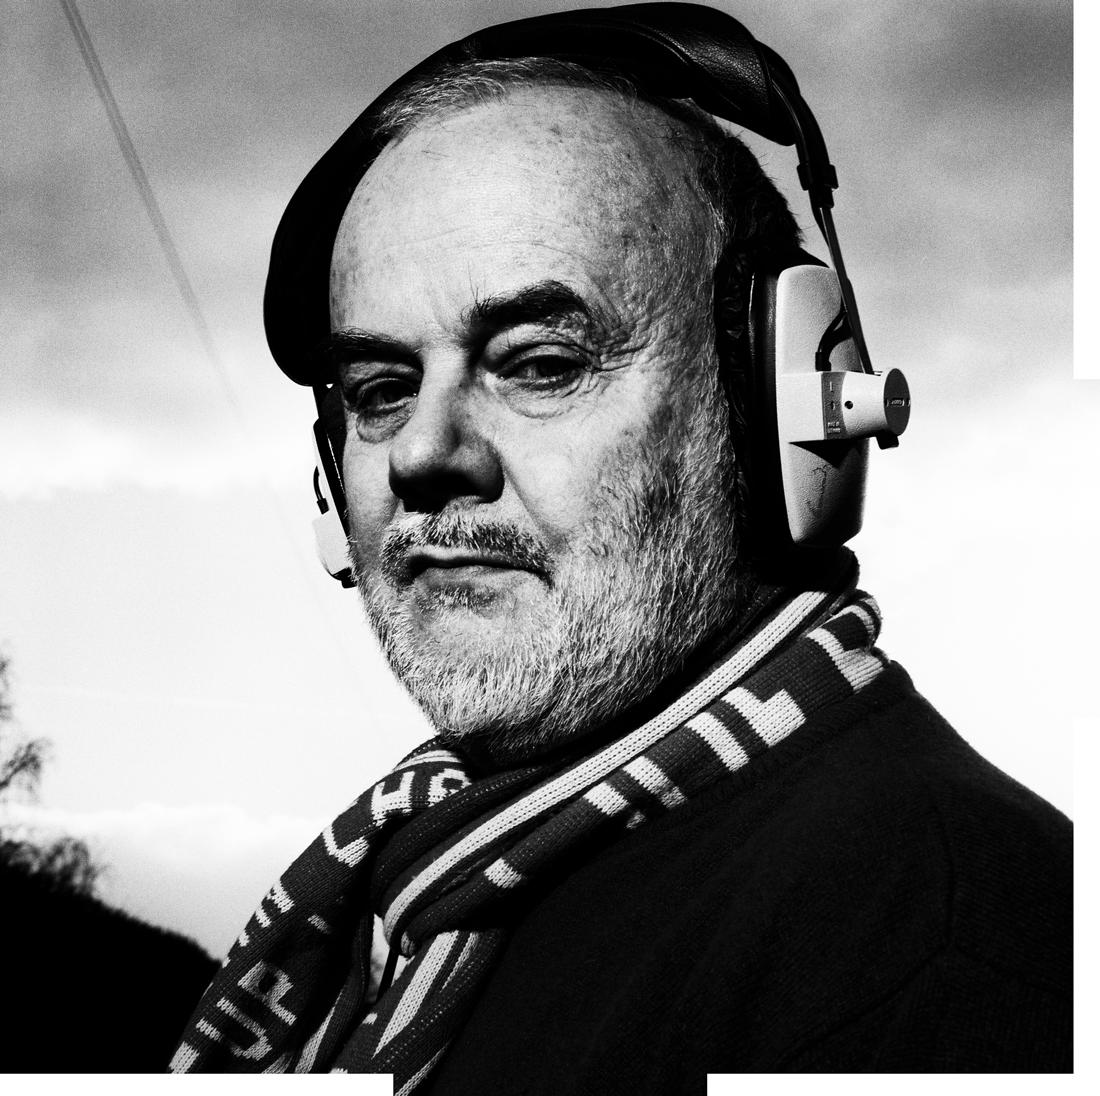 John Peel Porträt schwarz weiß